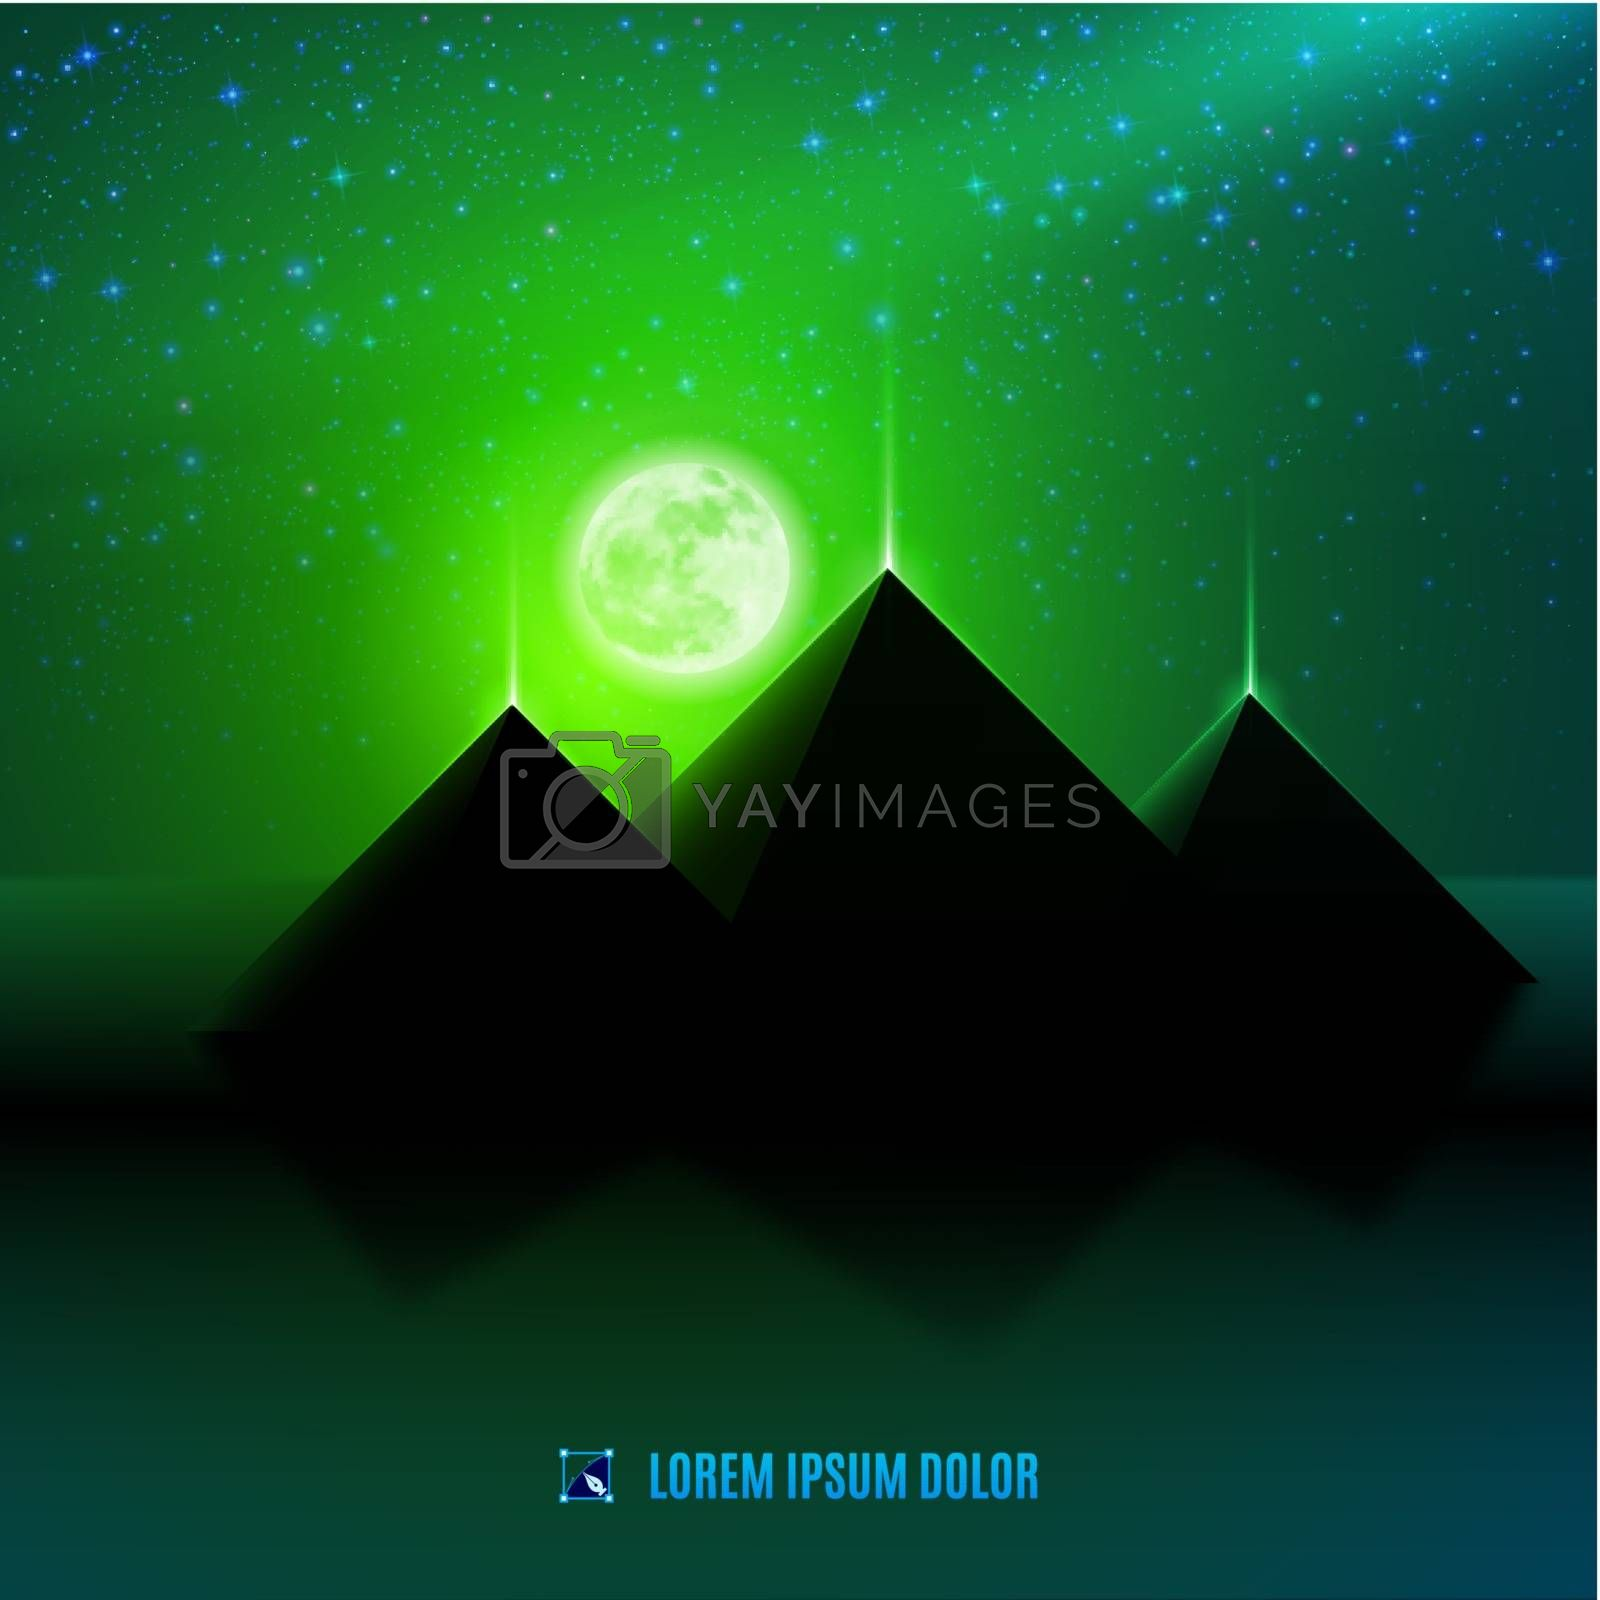 Royalty free image of Green night desert landscape by dvarg